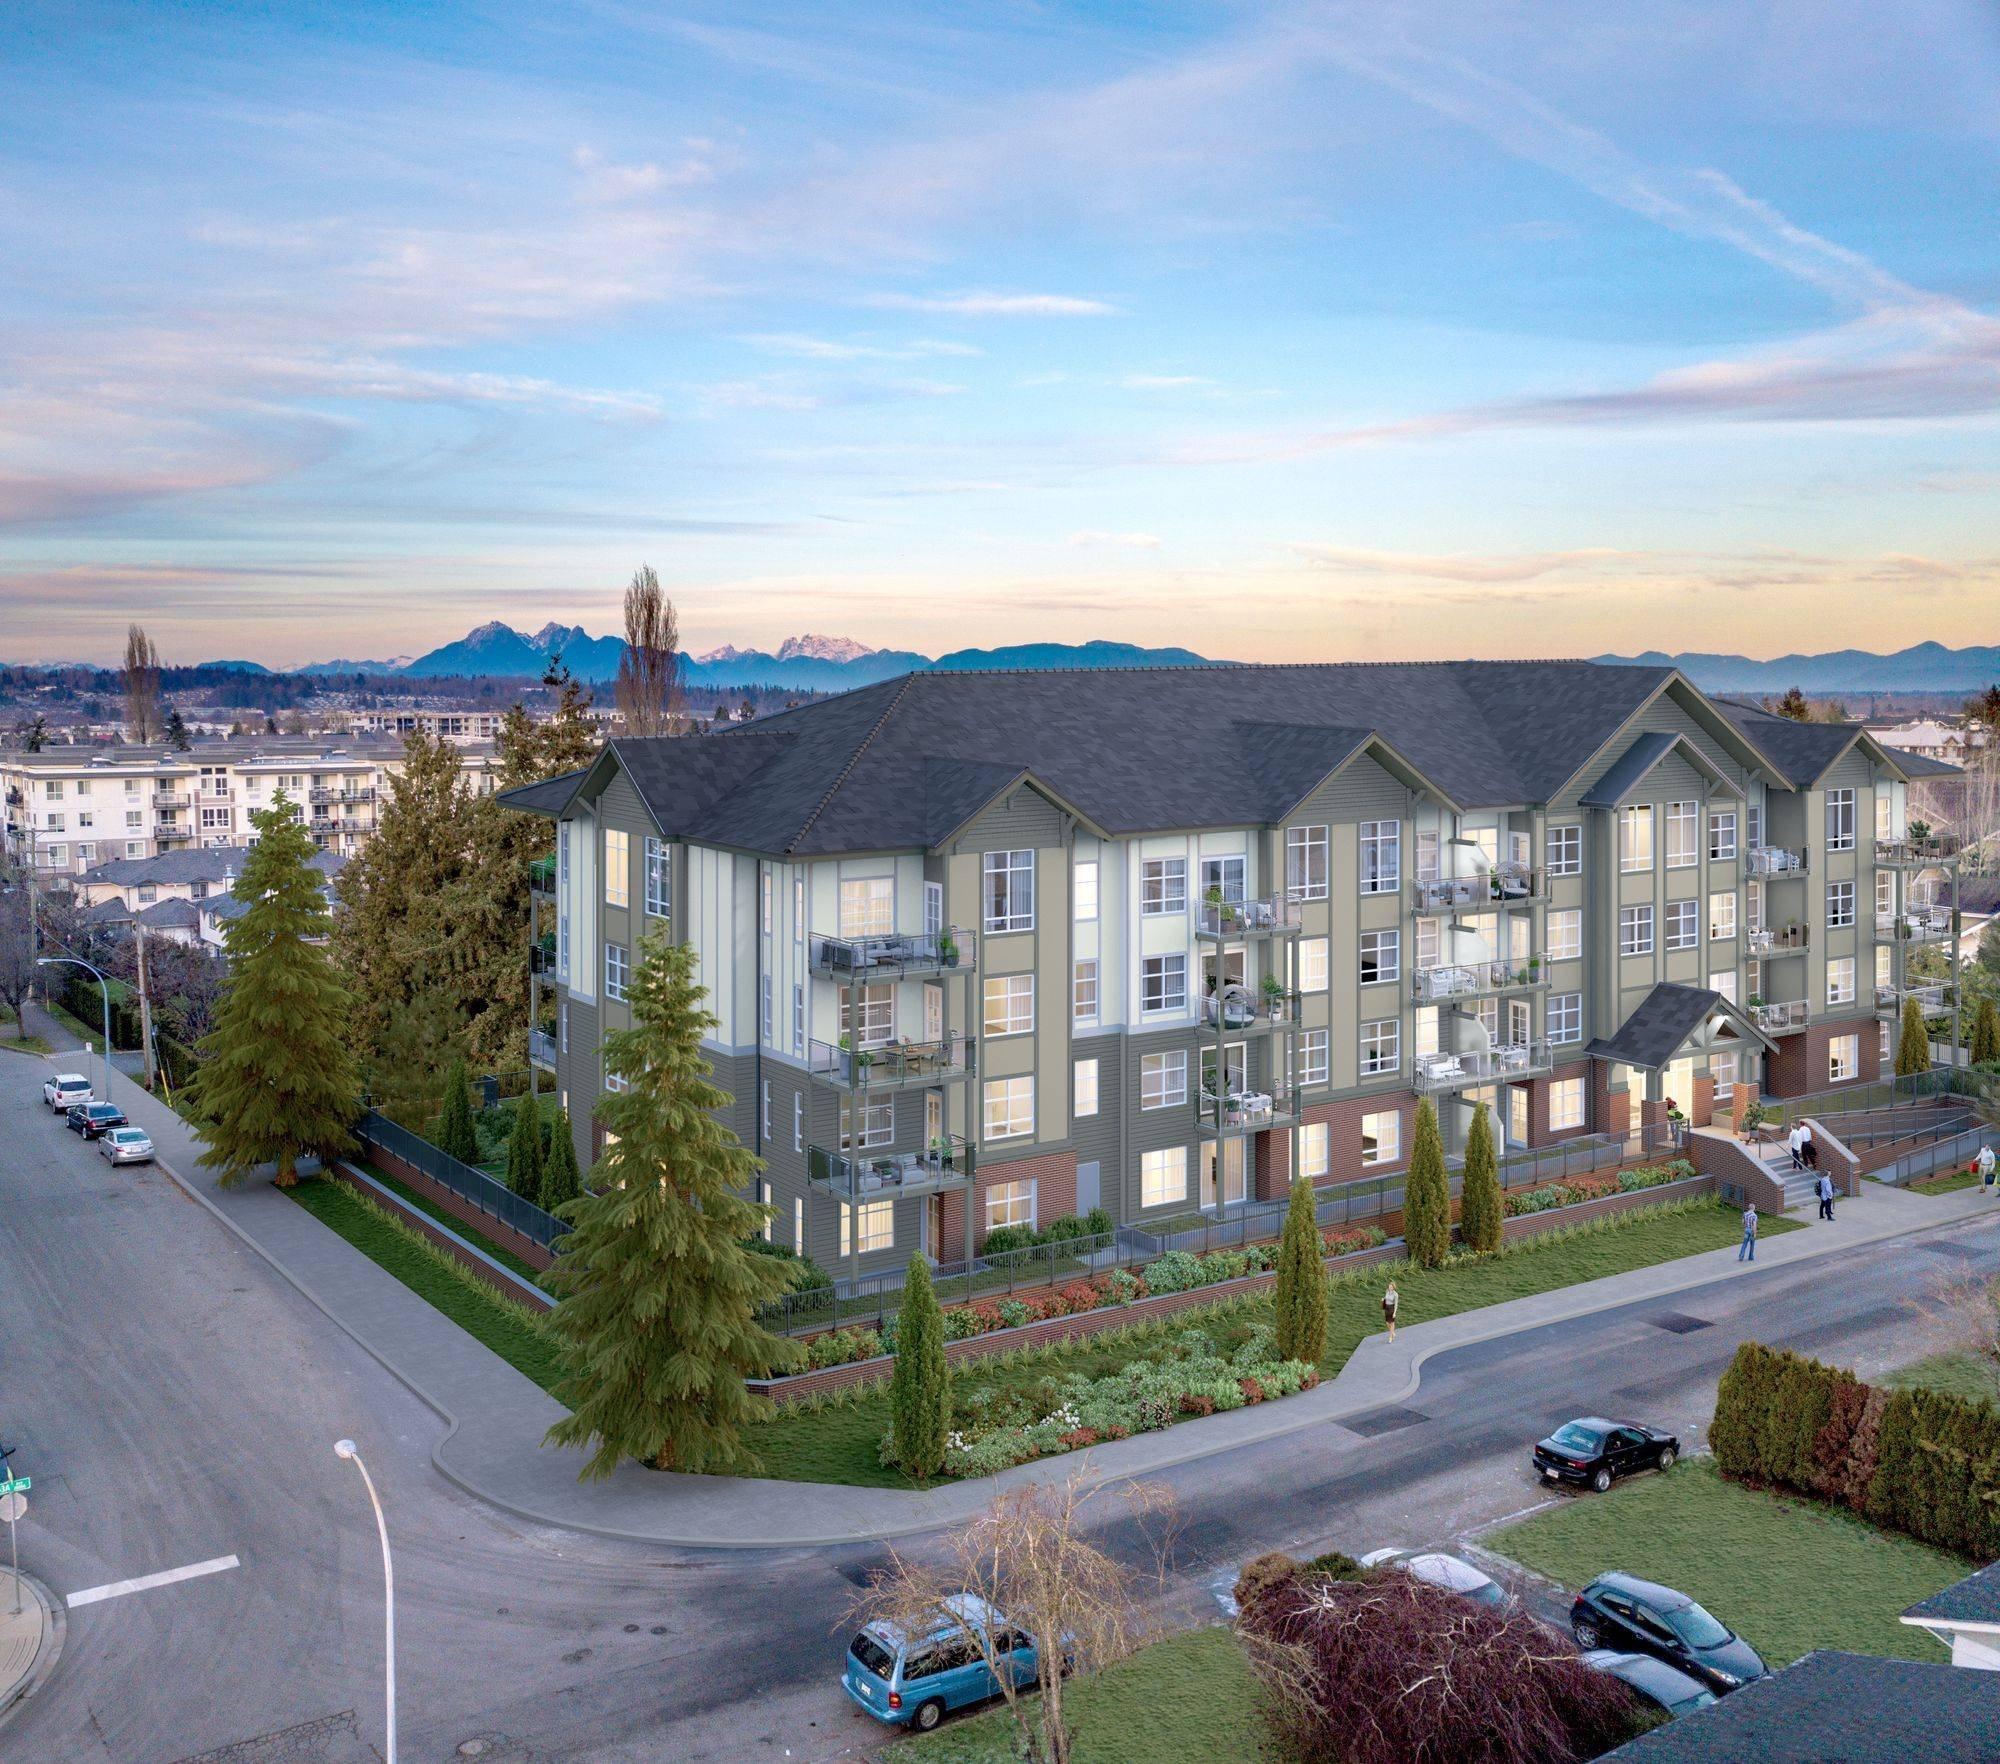 Exterior - 20115 53A Ave, Langley, BC V3A 3V4, Canada!